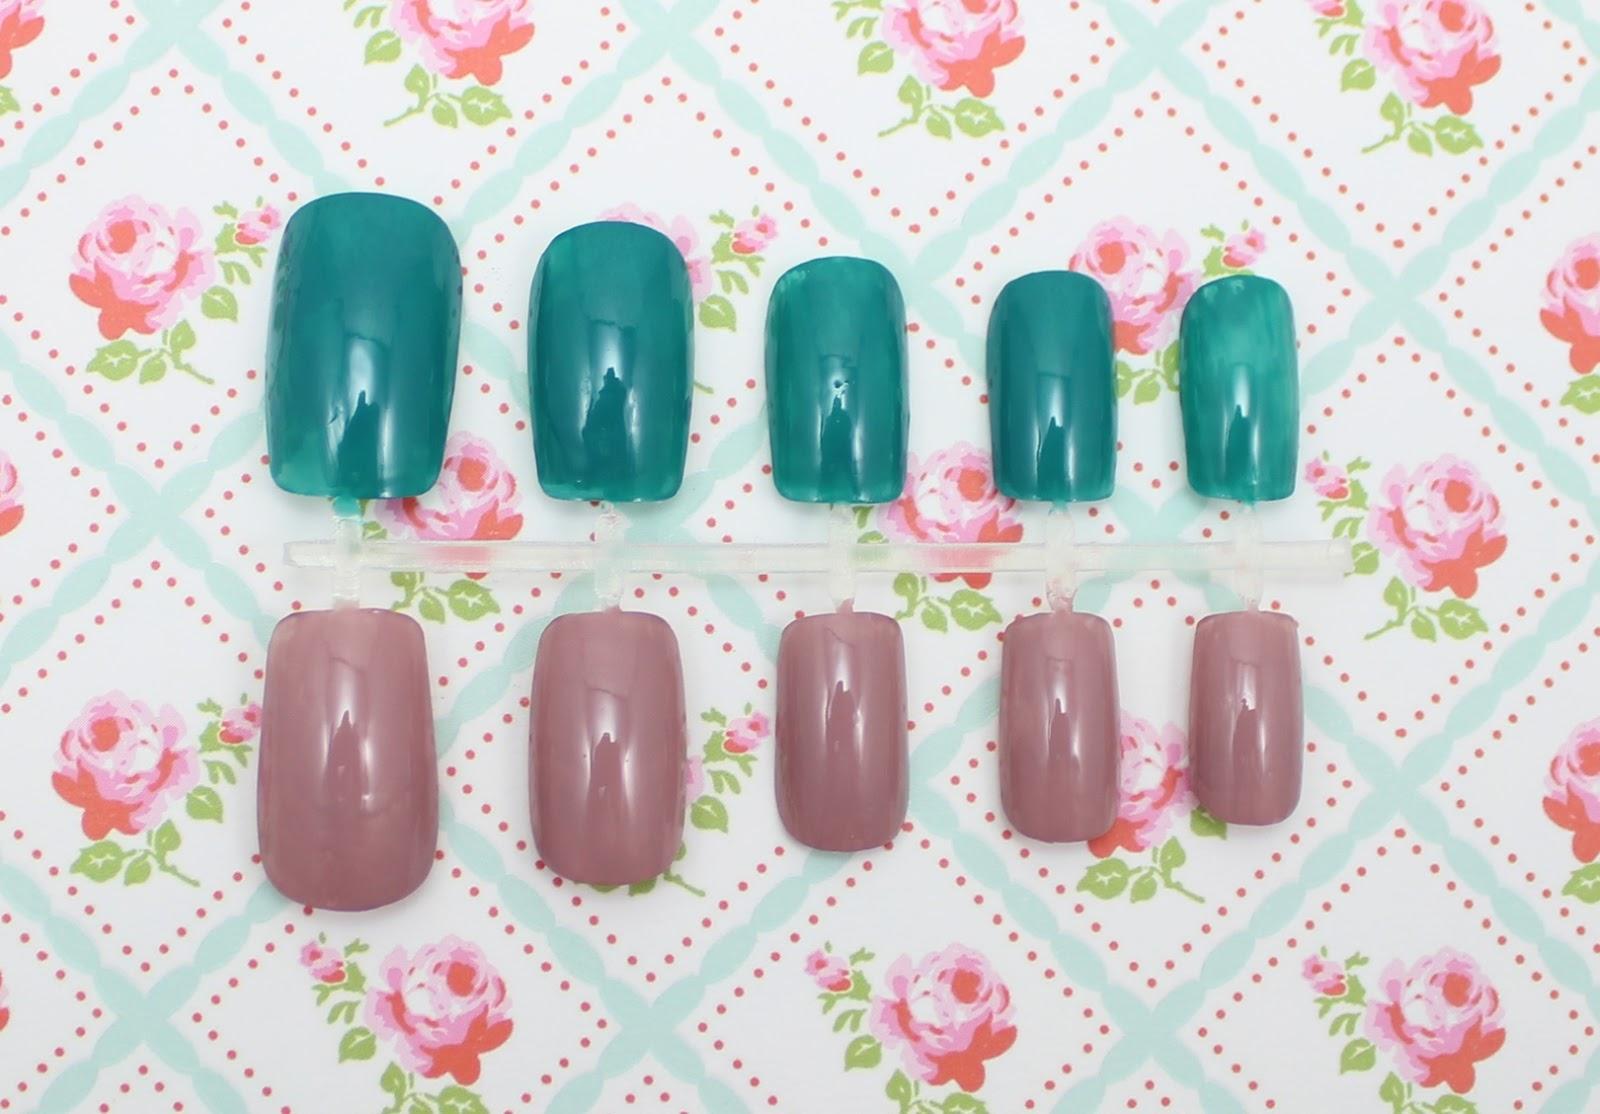 Ciaté mini mani month nail polish calendar